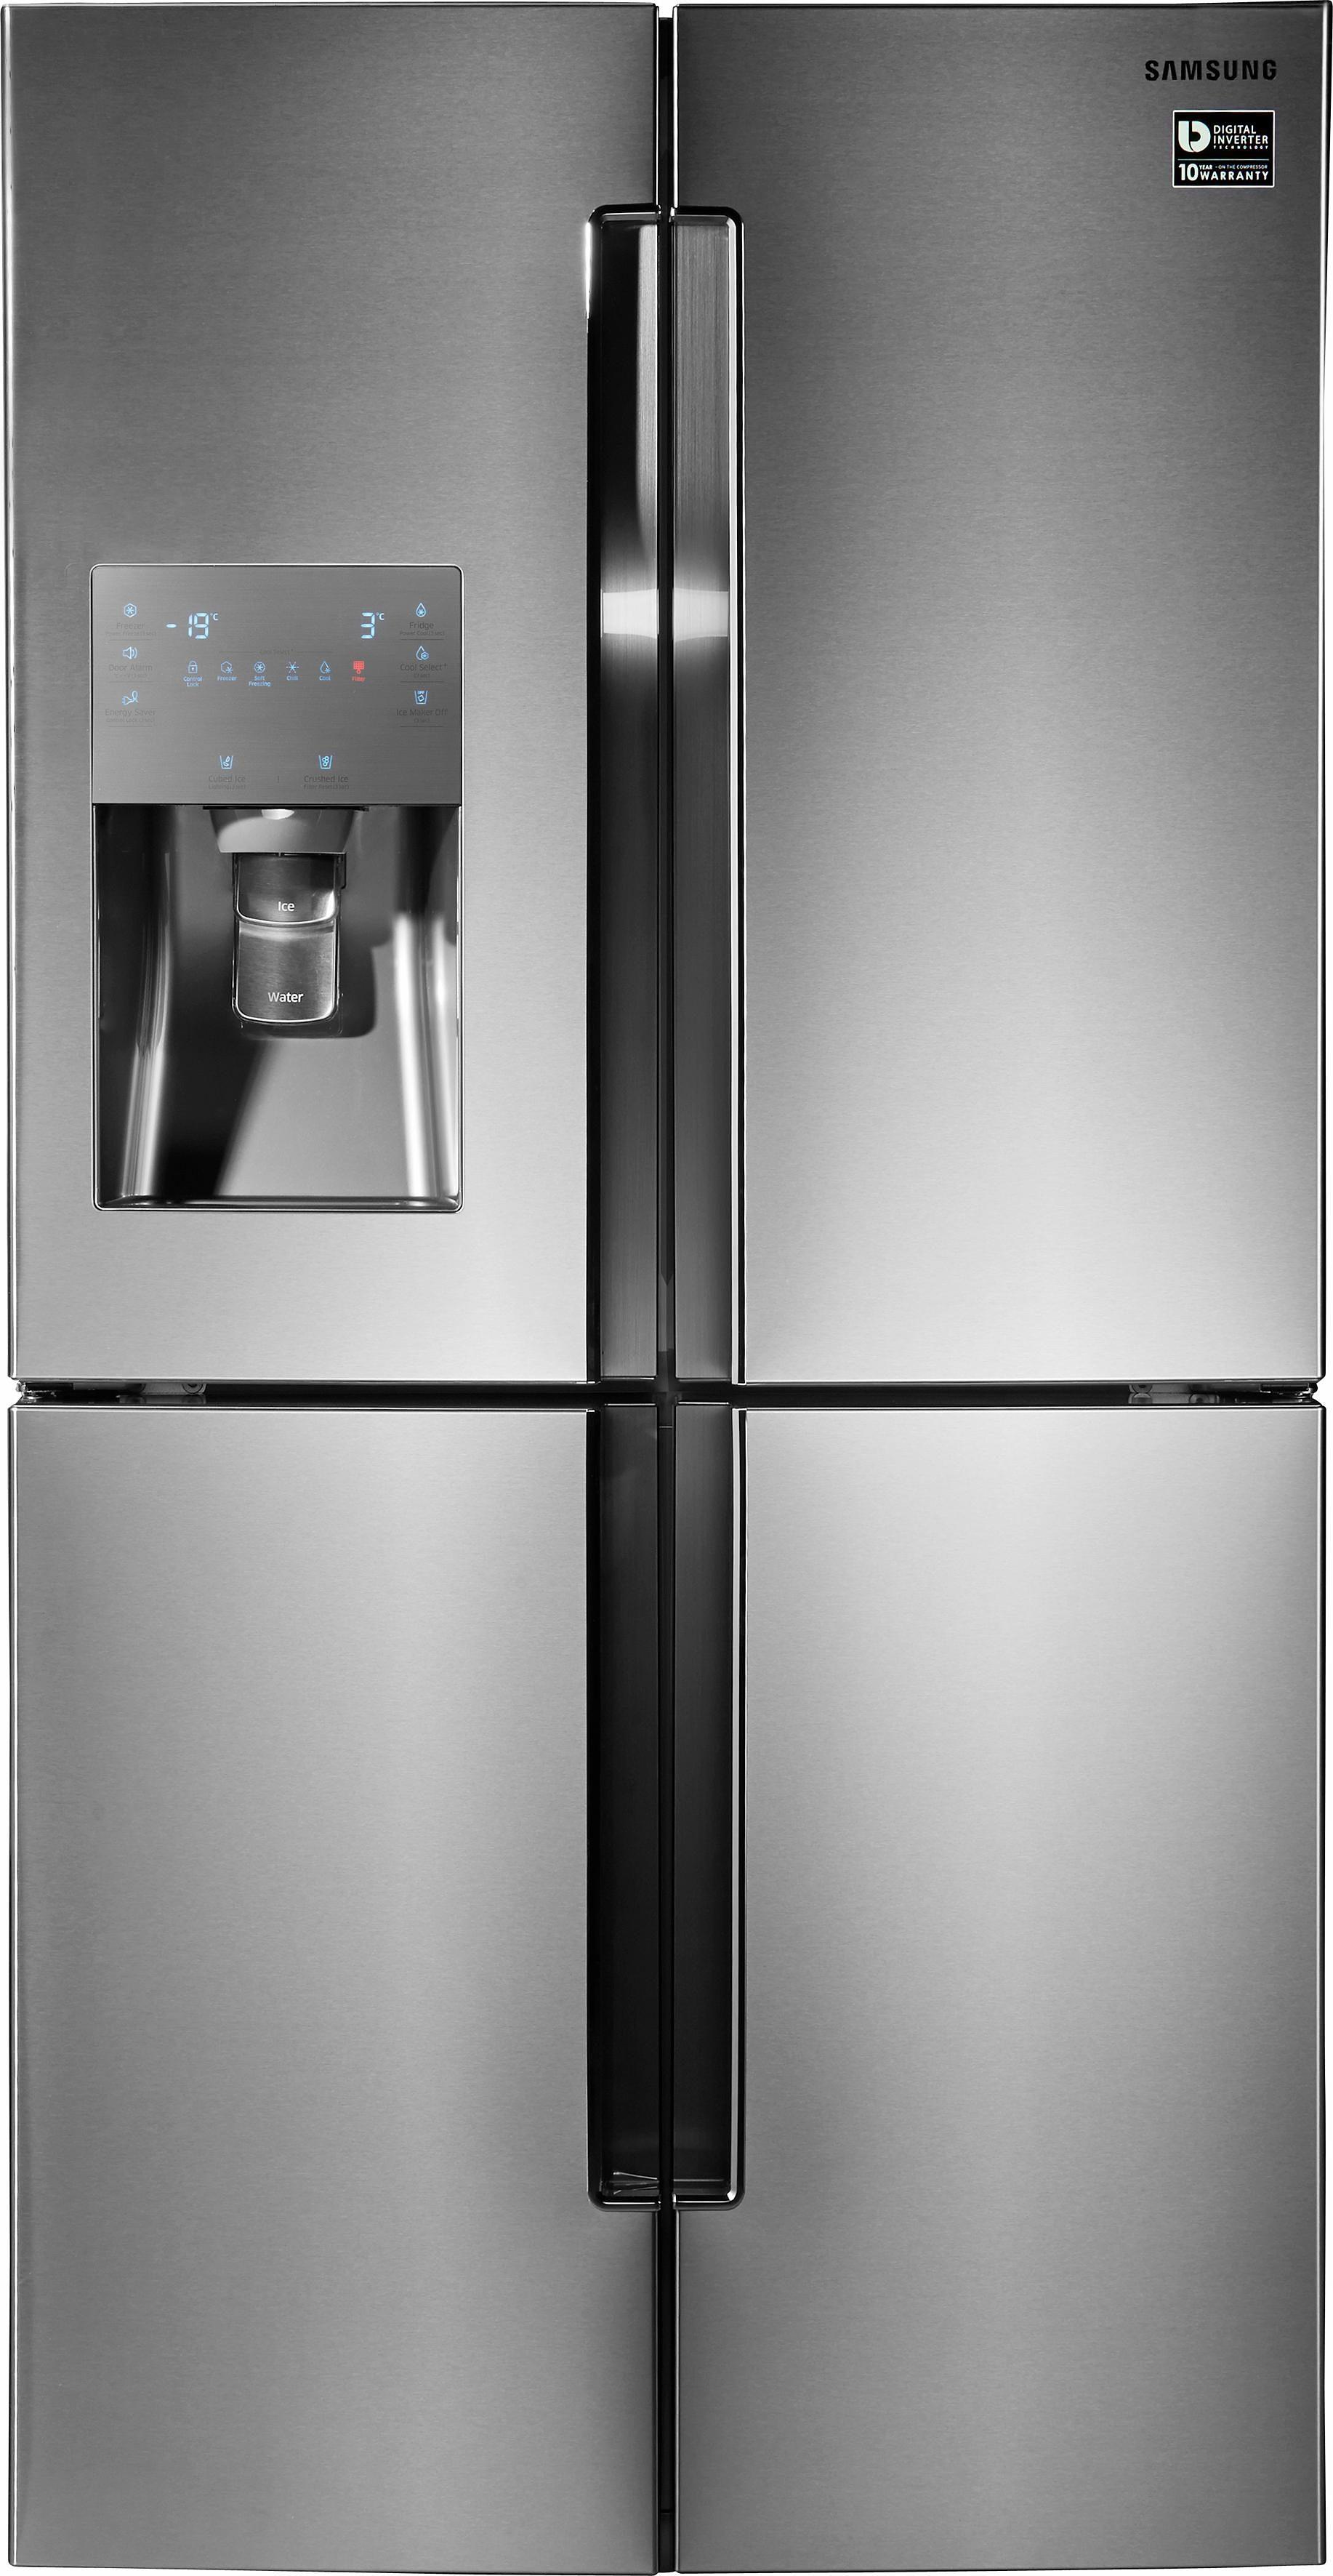 Samsung Side-by-Side T9000 RF56J9041SR/EG, A++, 182,5 cm hoch, NoFrost